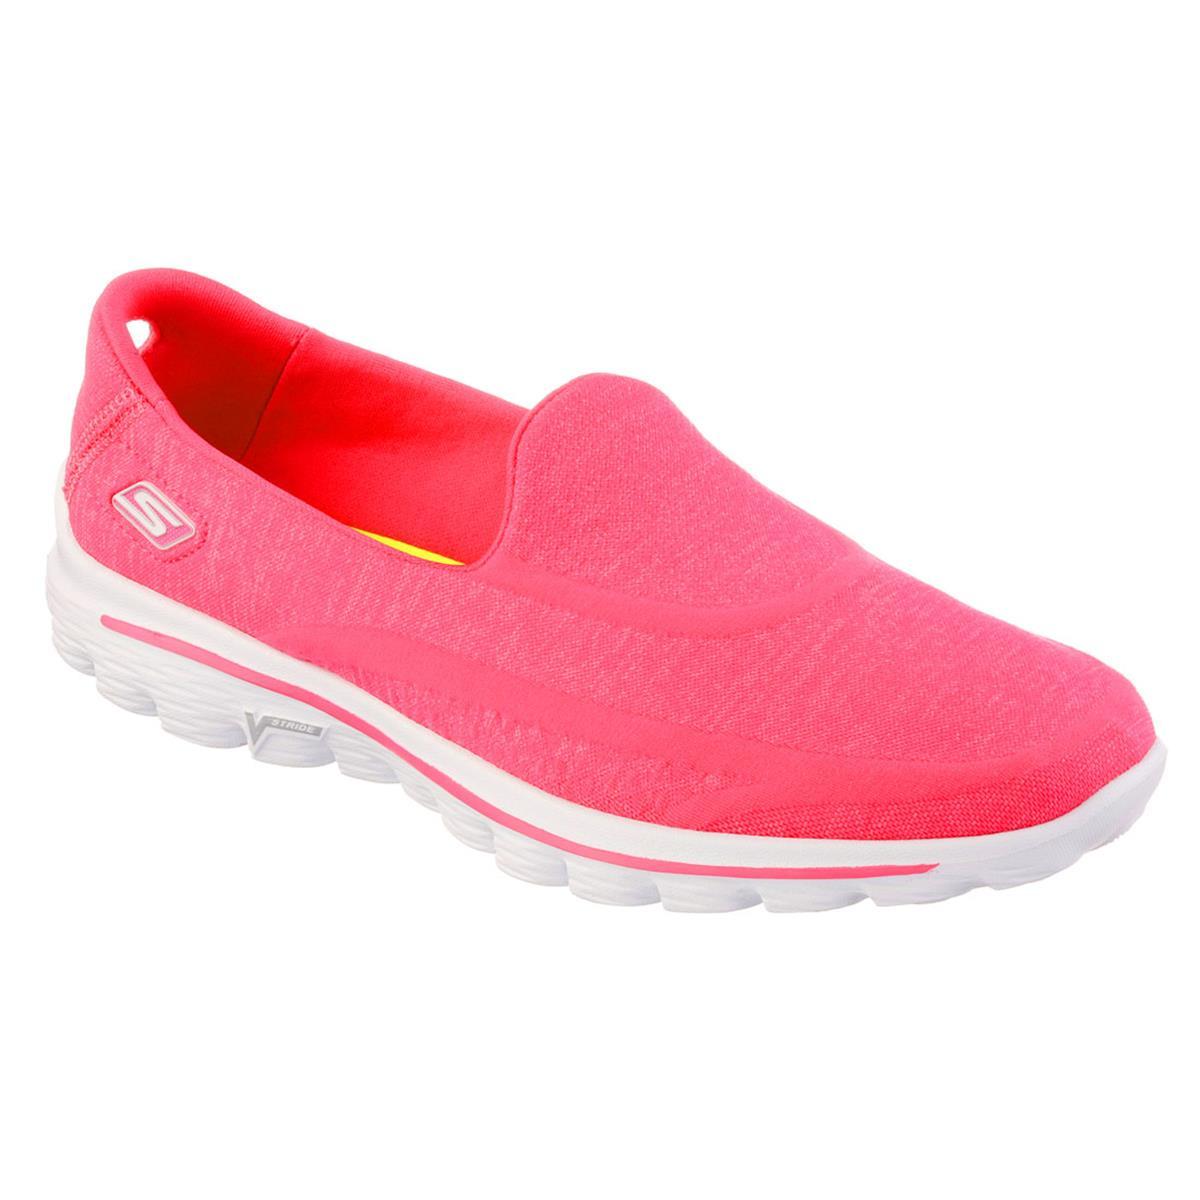 Shoe Dept Adidas Socks